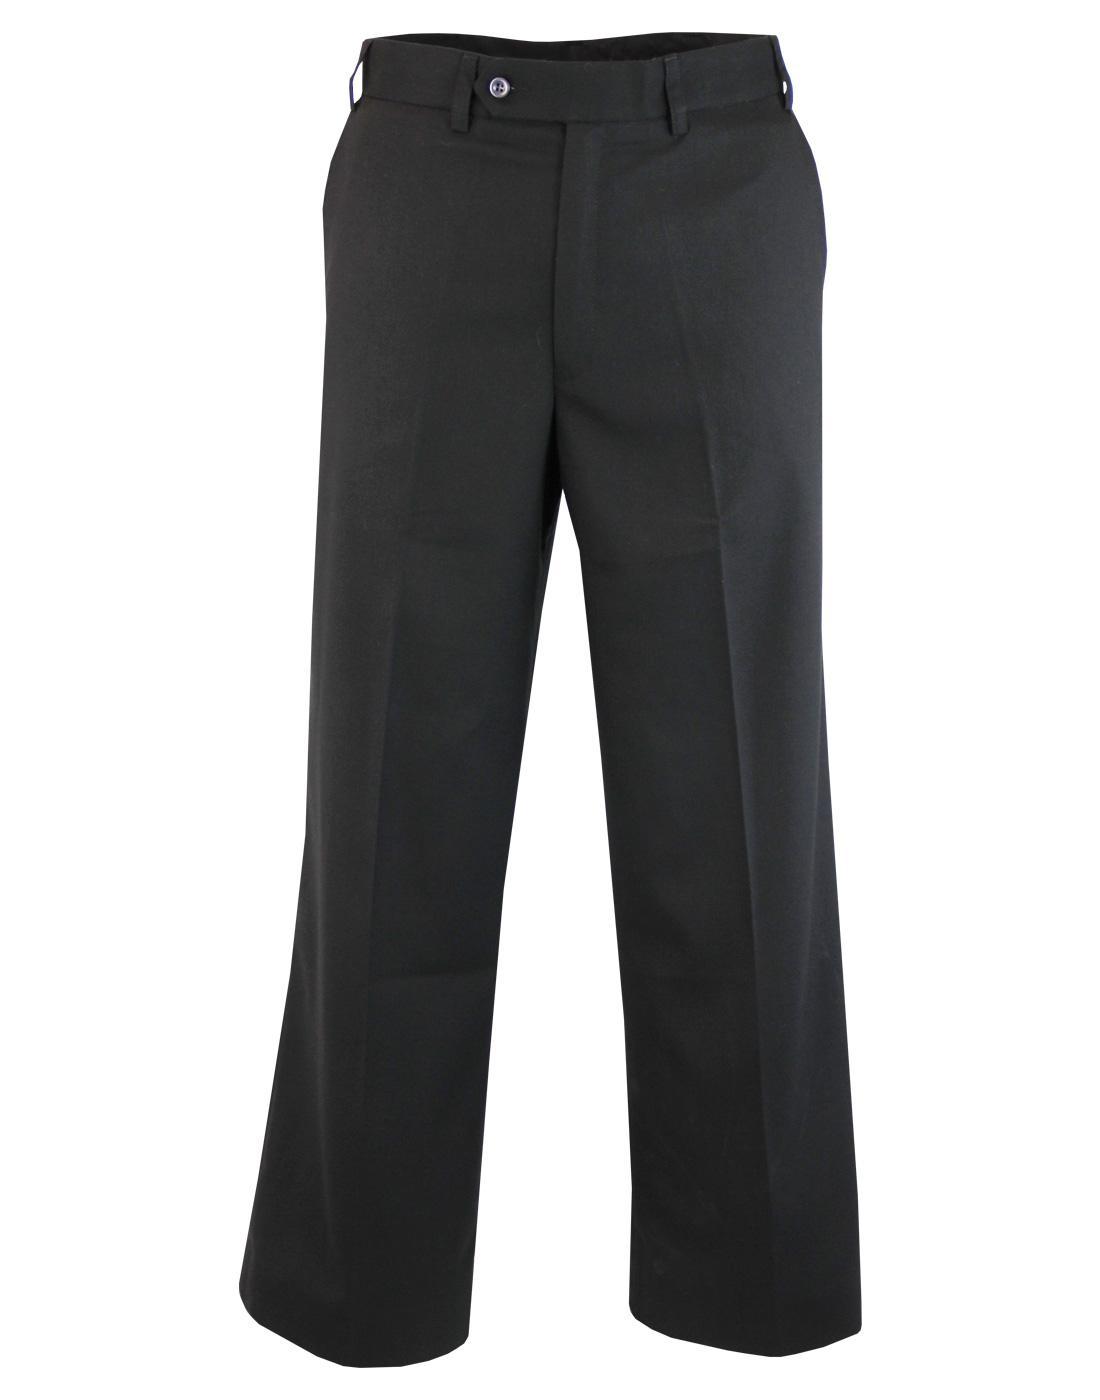 WIGAN CASINO Northern Soul Oxford Bags Trousers B